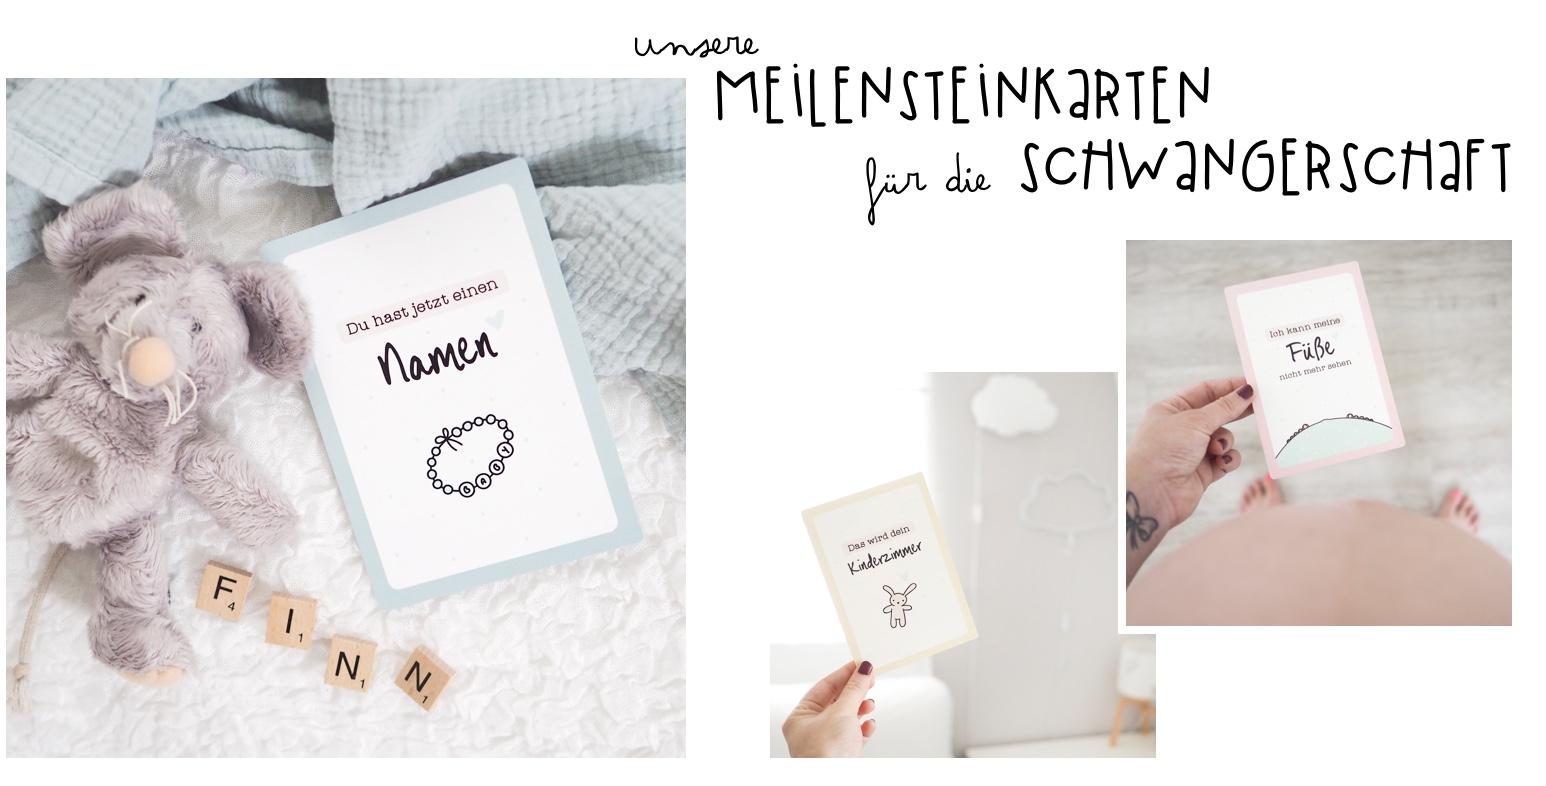 _Meilensteinkarten-Schwangerschaft